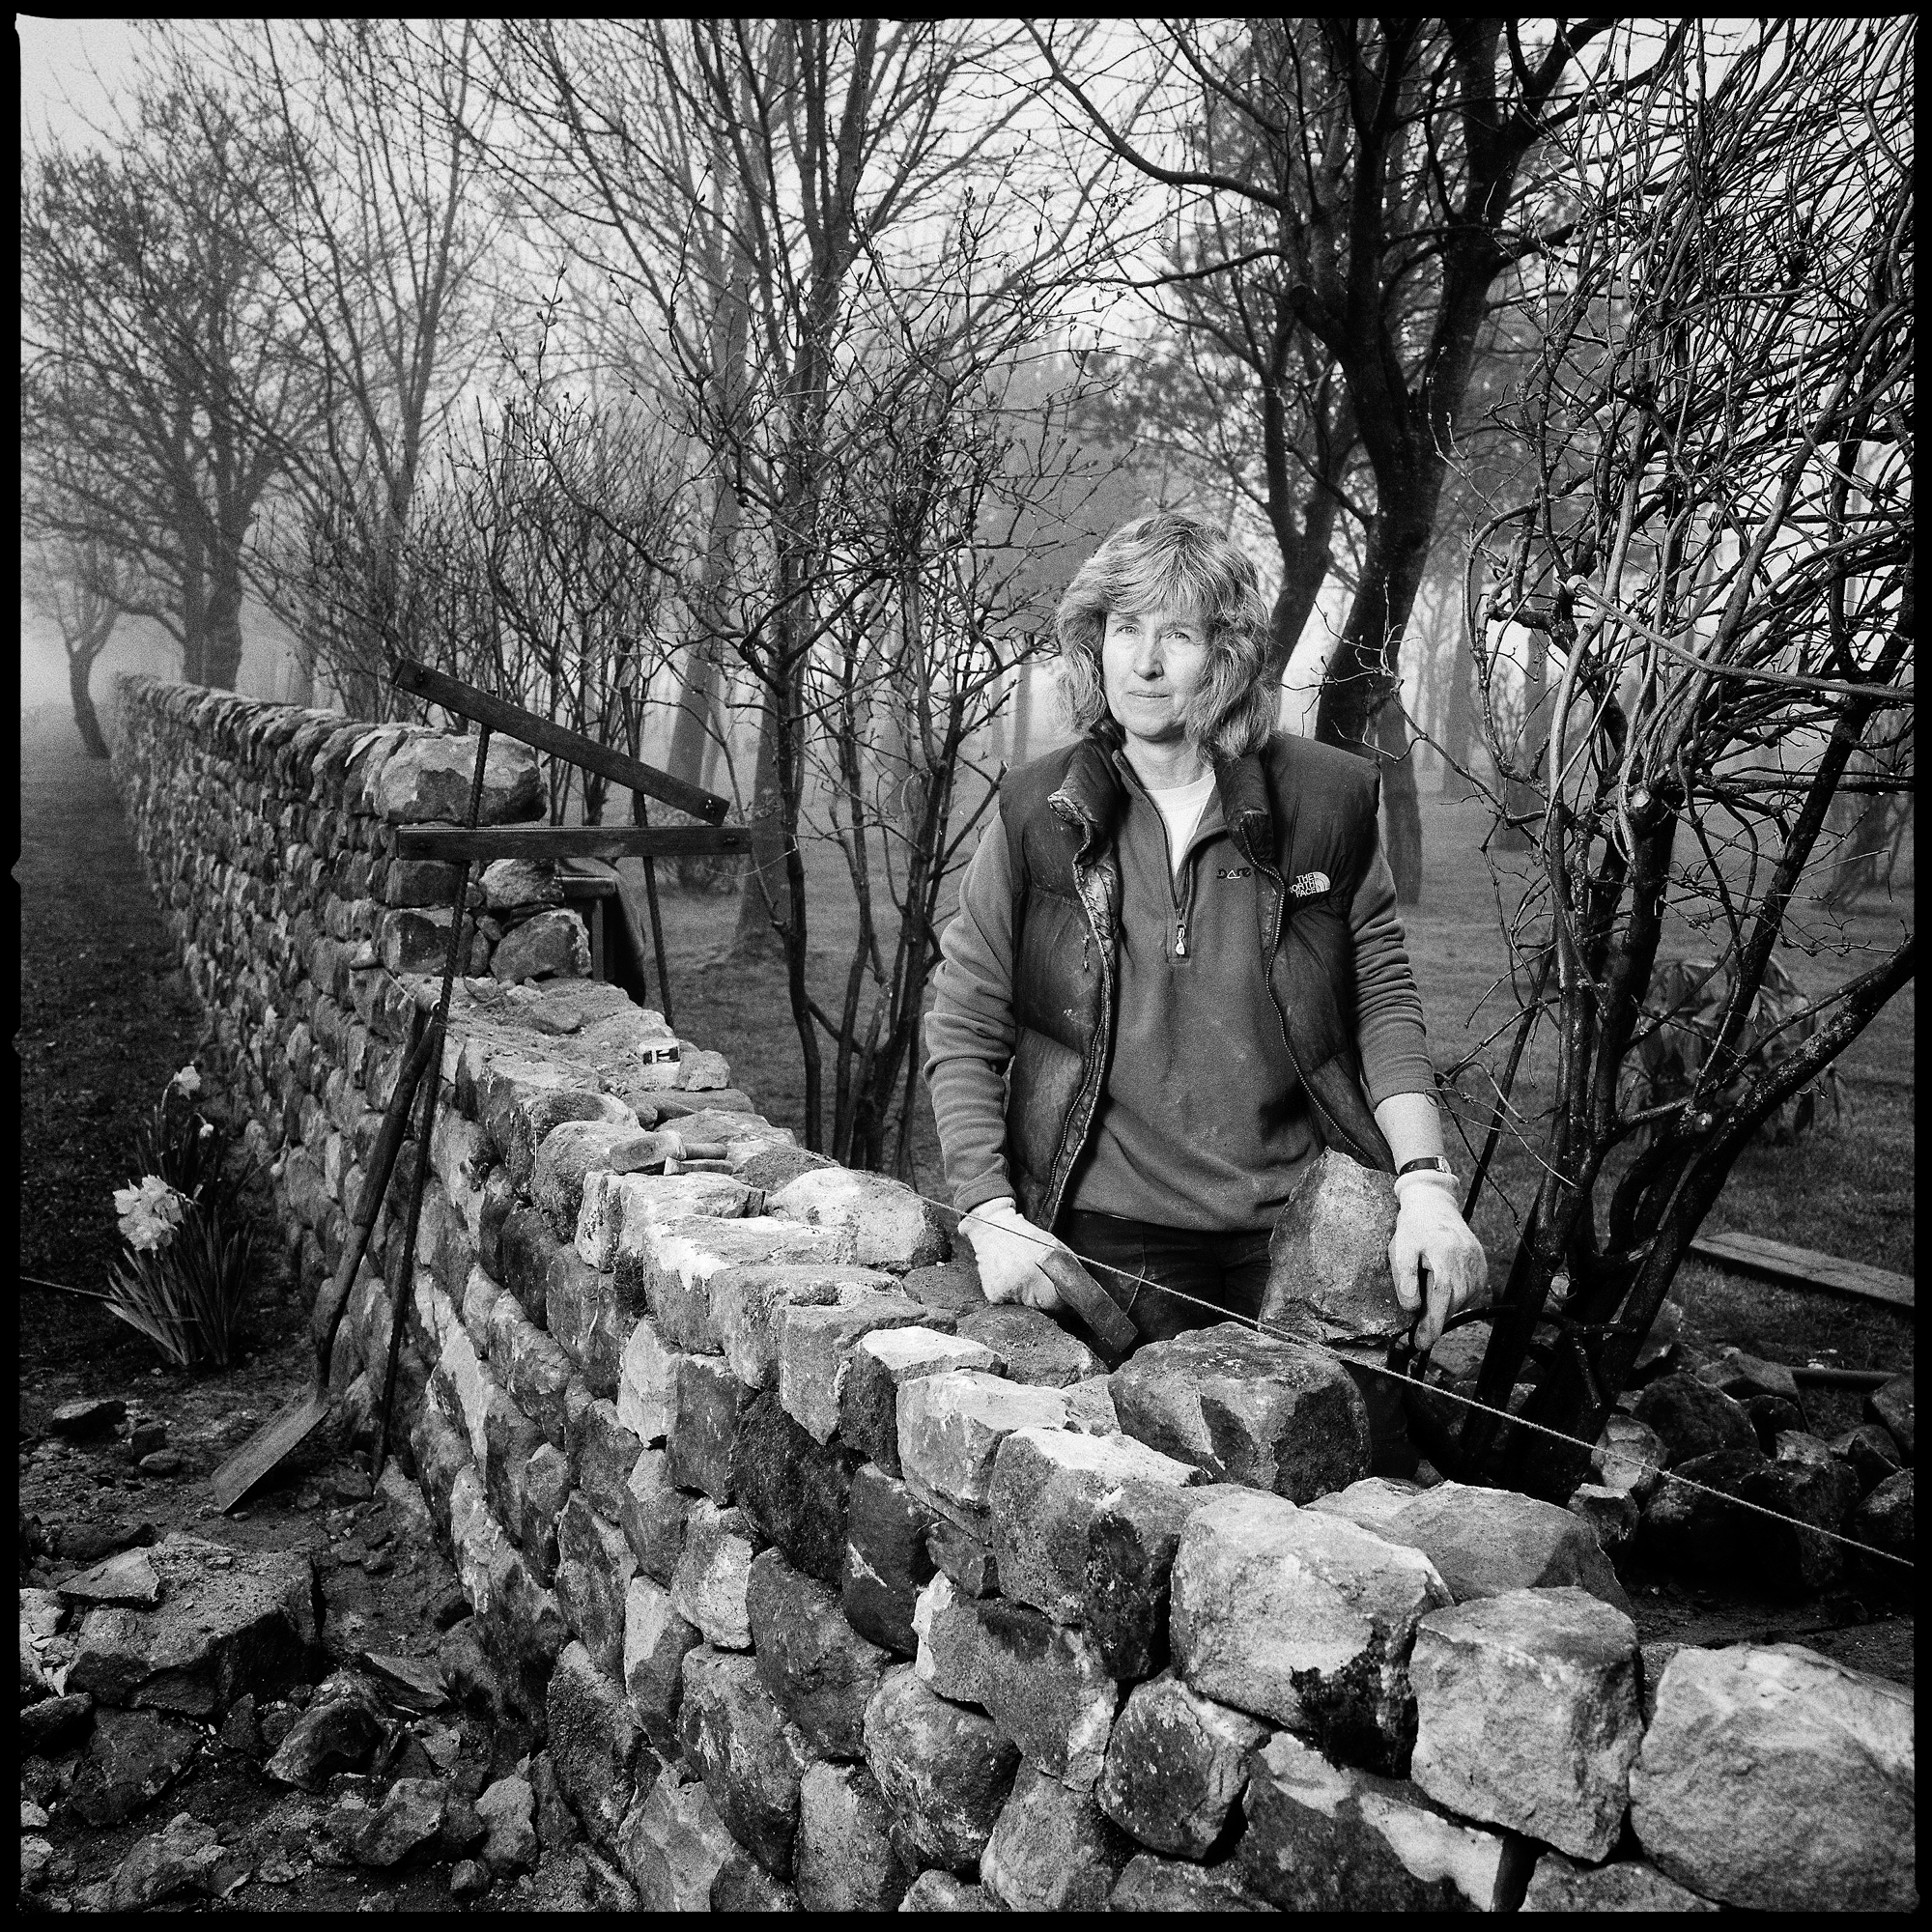 Tracey Blackwell, Drystone Waller